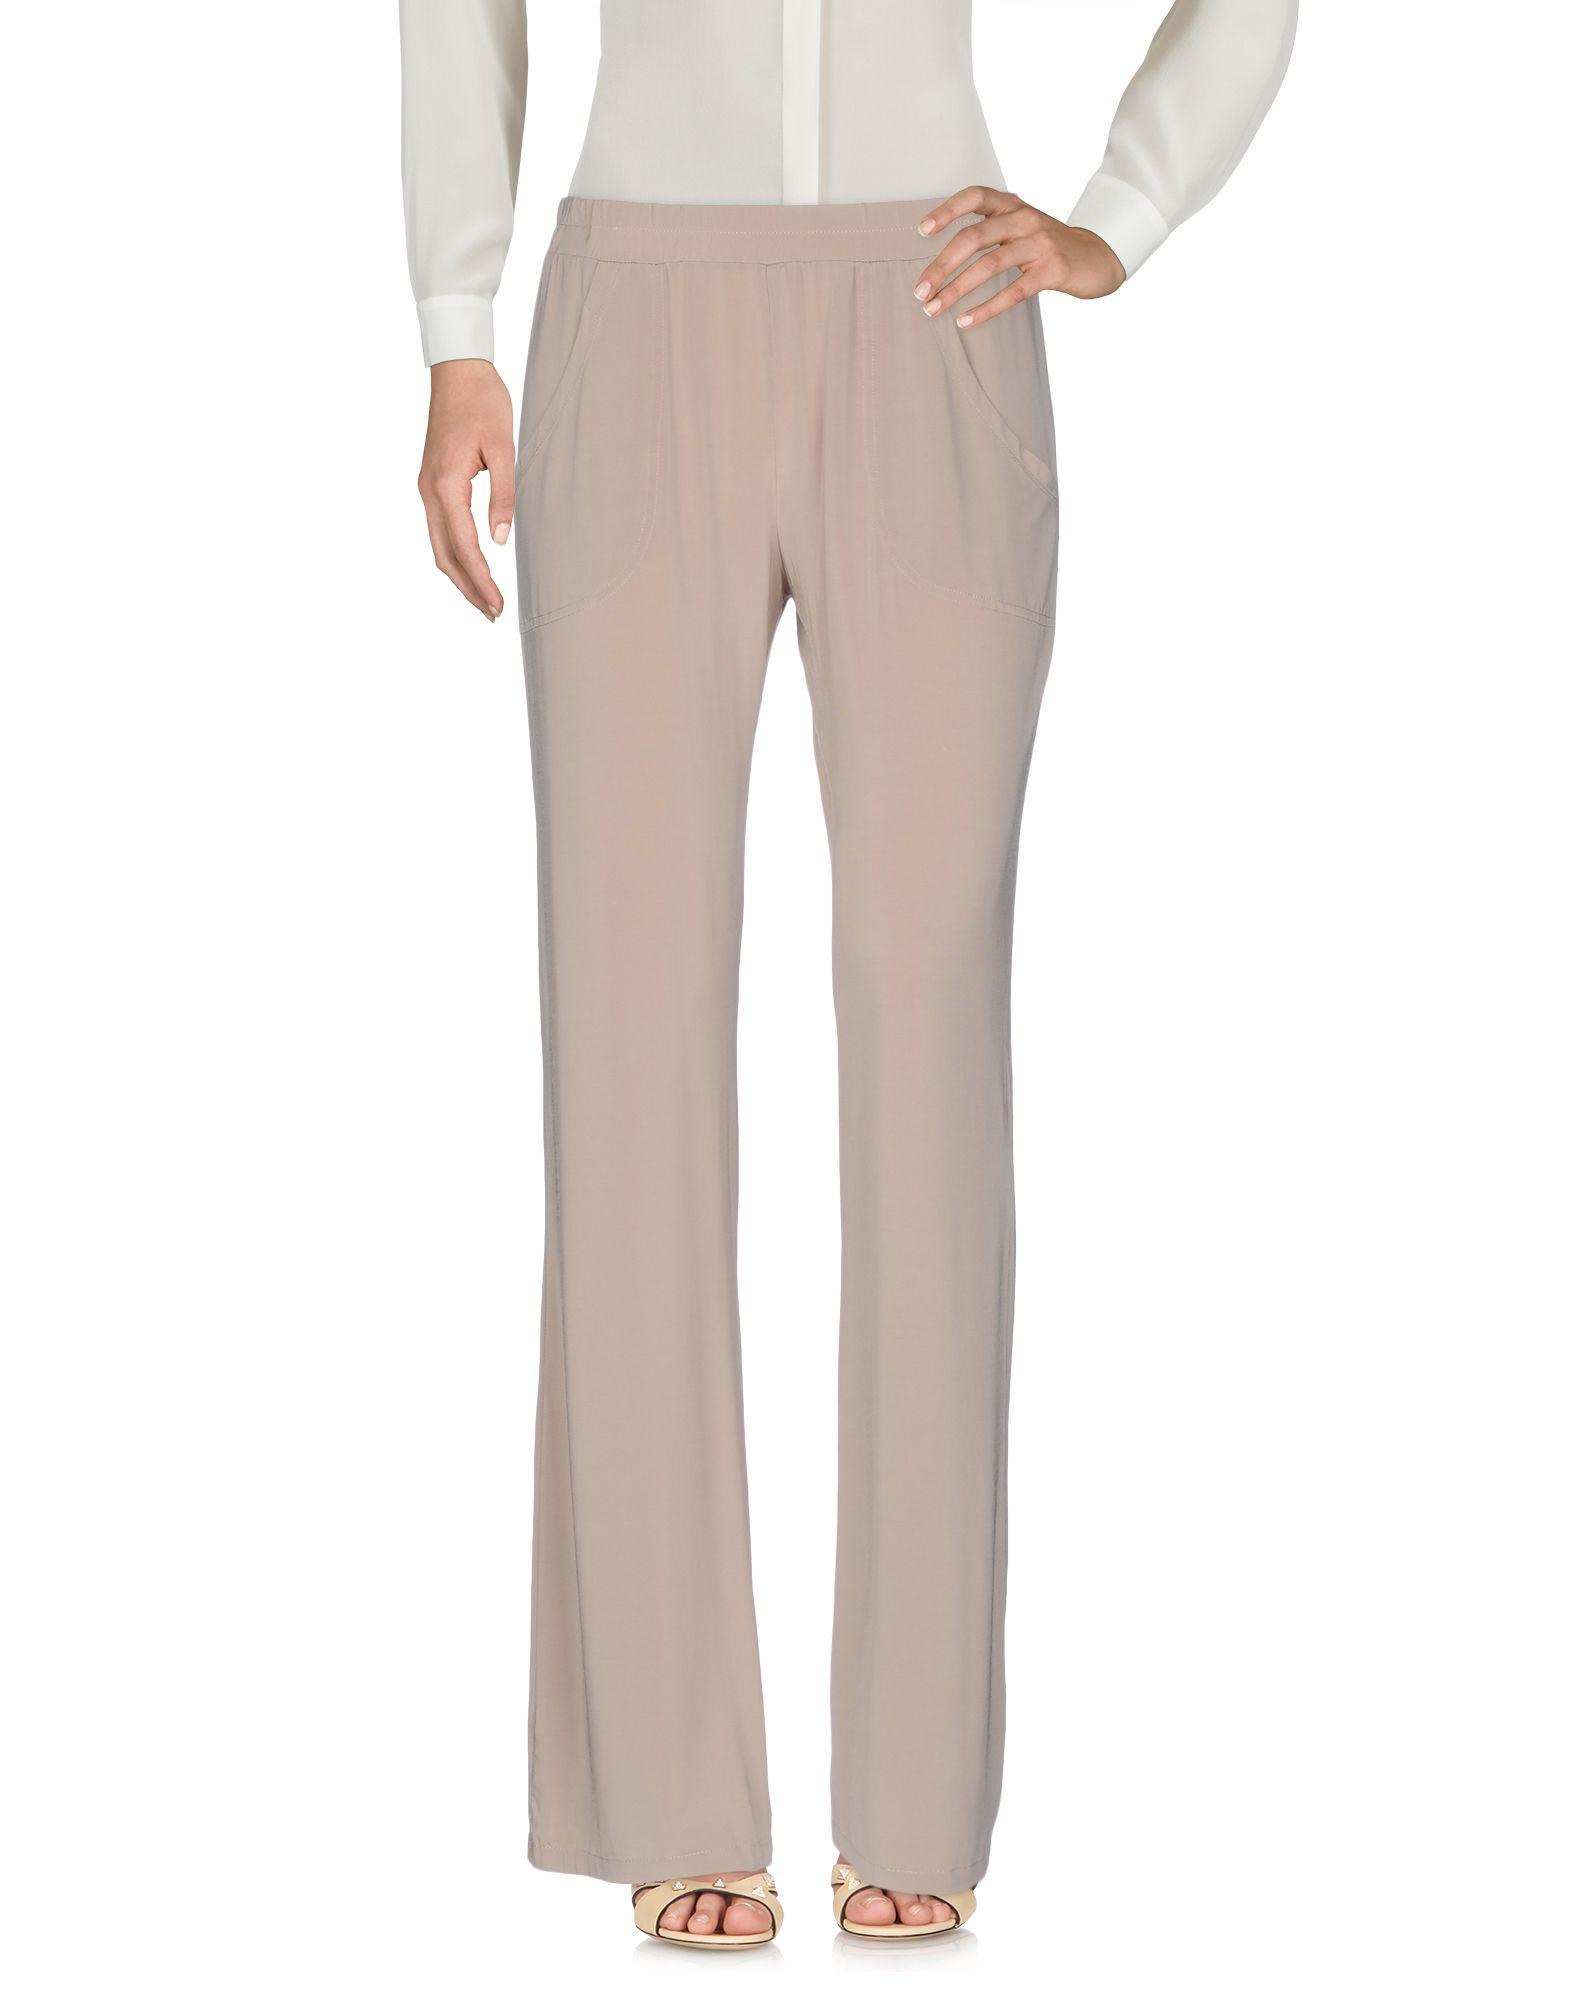 Pantalone Kangra Cashmere Donna - Acquista online su LPxcMWU